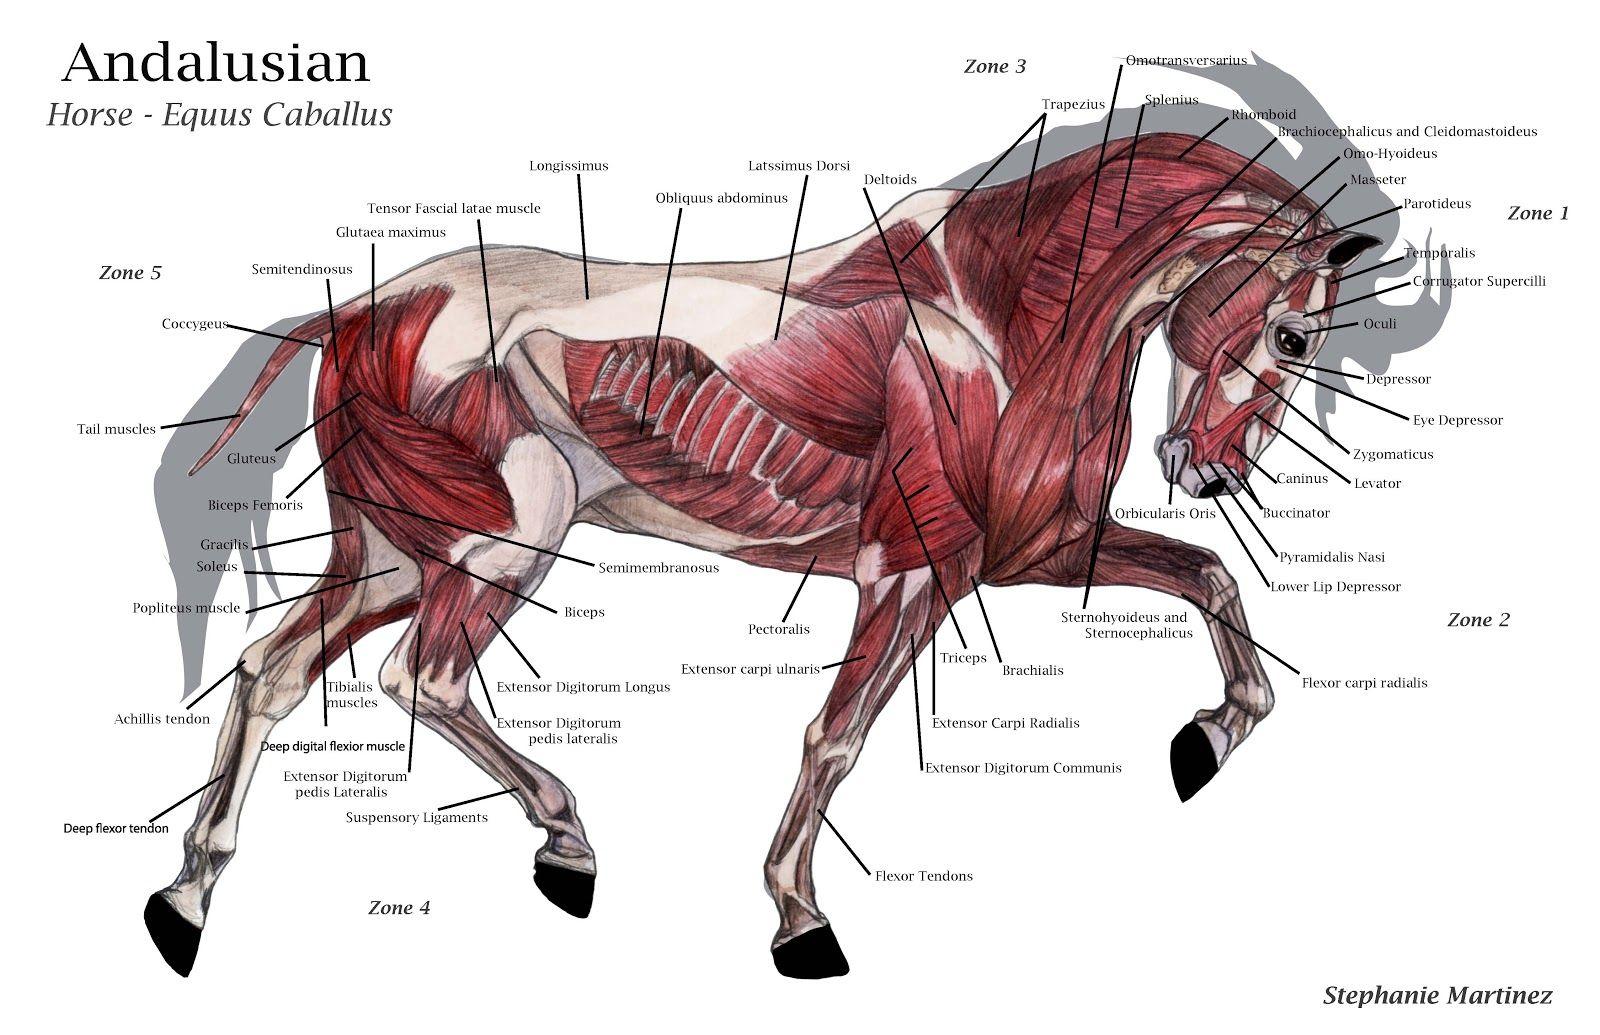 horse anatomy diagram muscles 4l60e transmission wiring model google search 動物 哺乳類 pinterest